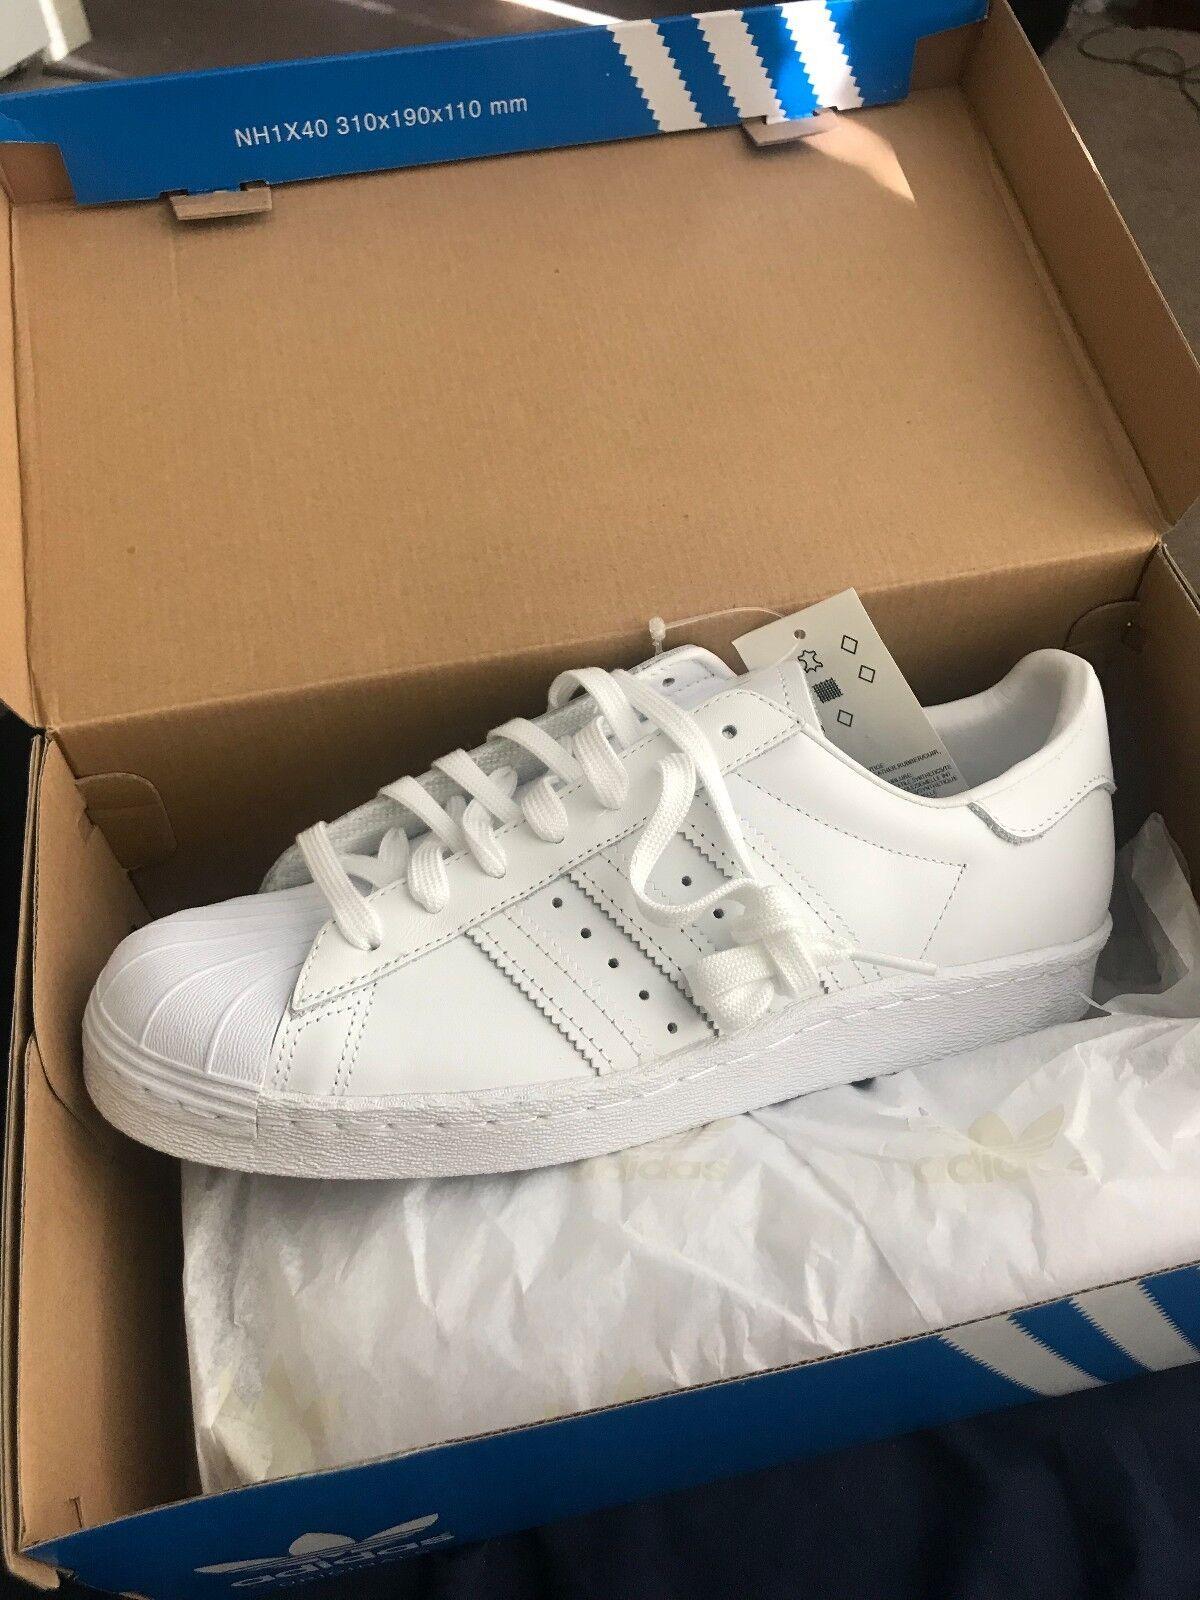 White superstar 80s original new. (men's) size 8. Brand new. original In a box. 567ff0